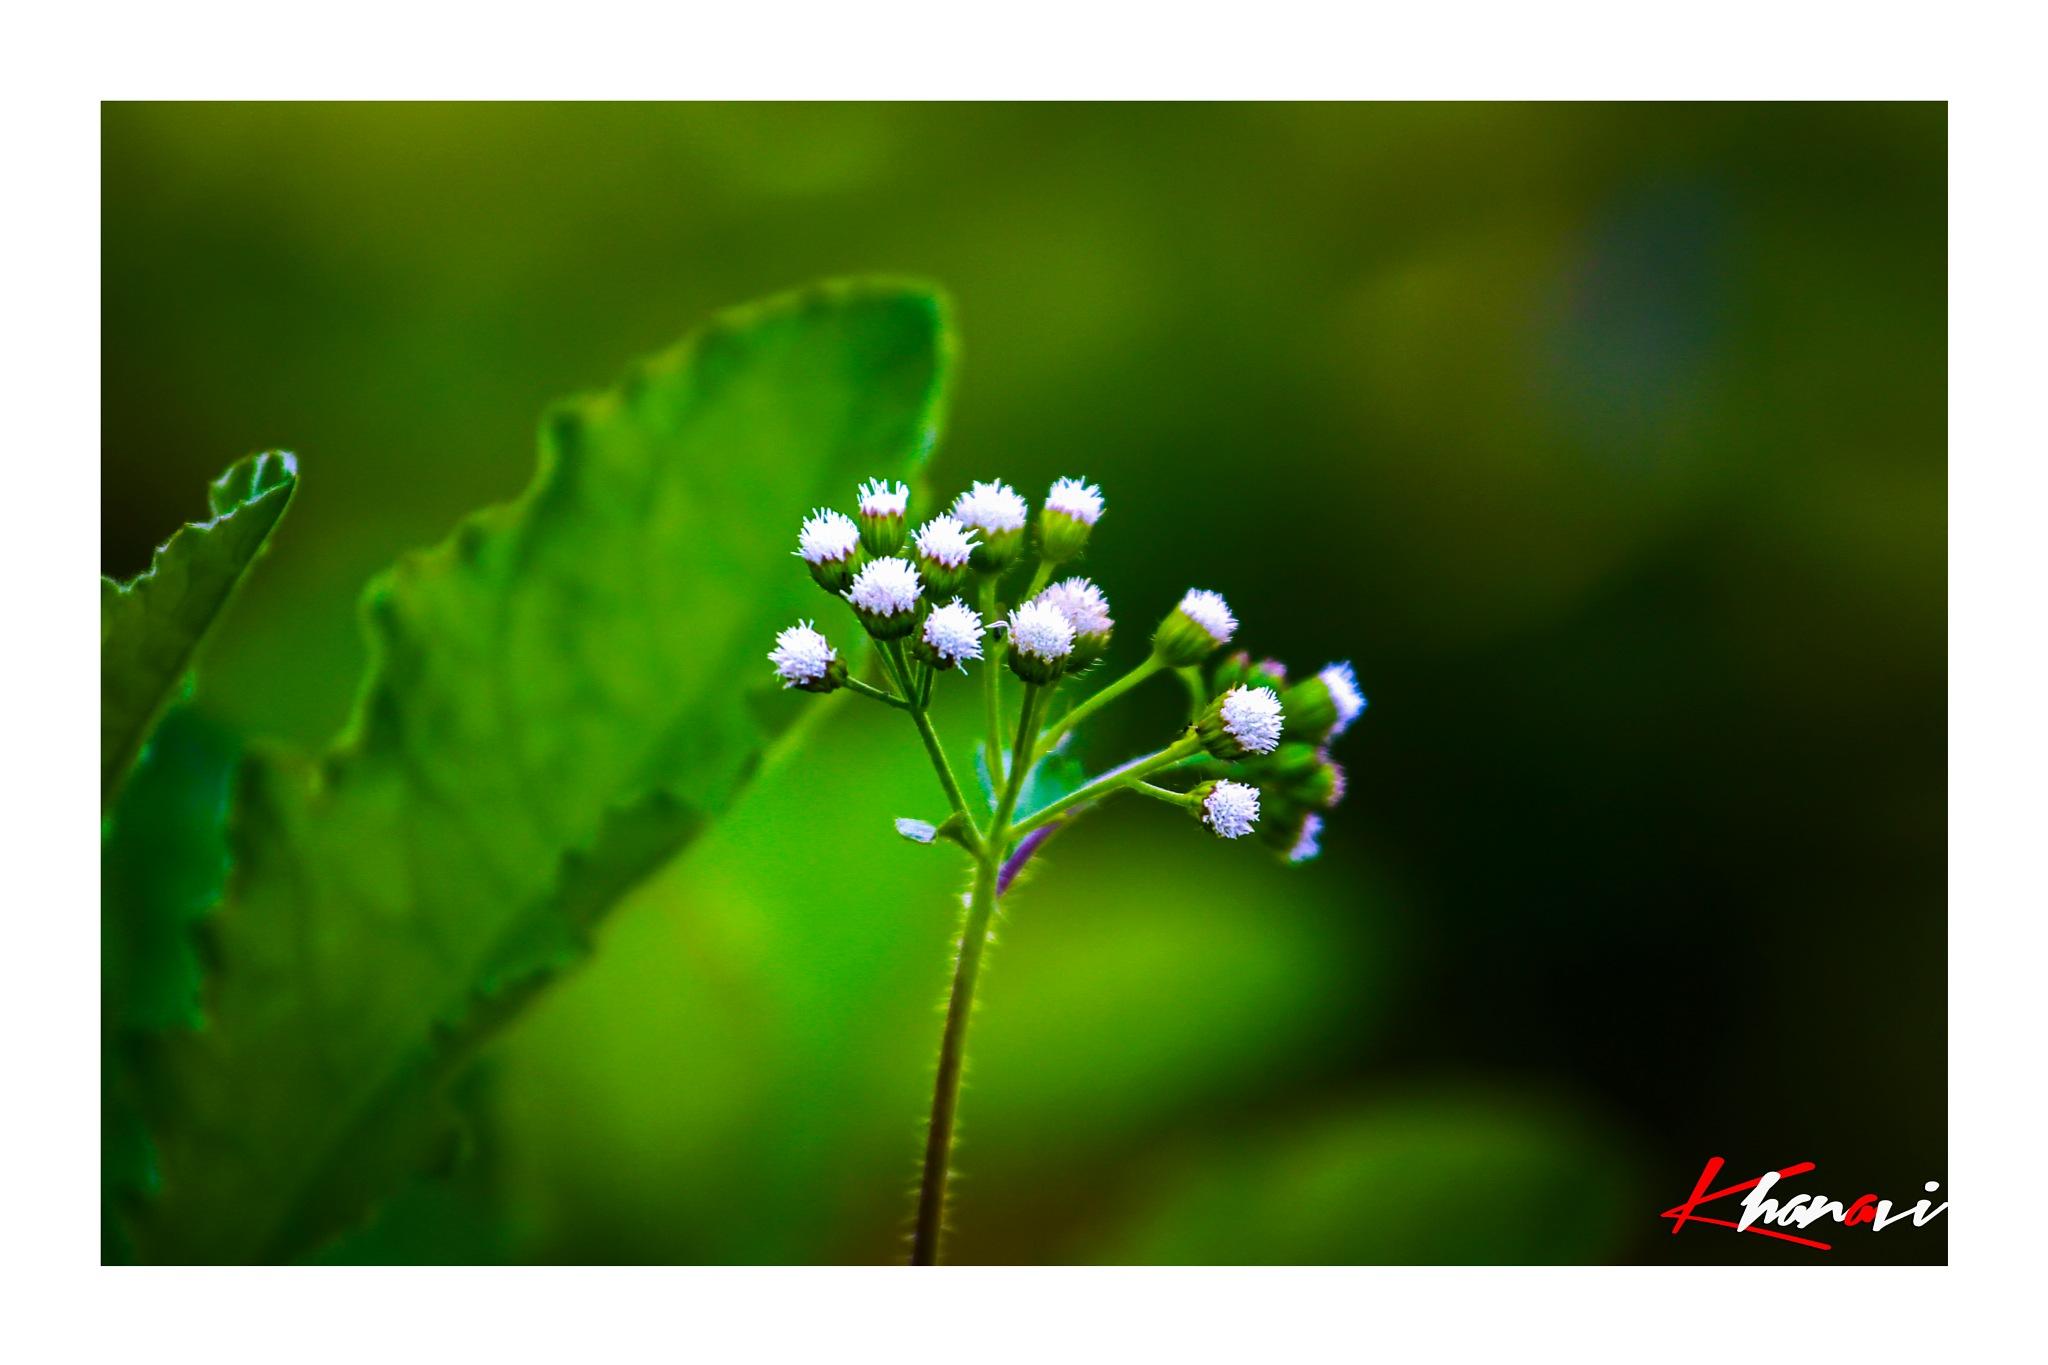 Nature flowers by Khan Avi